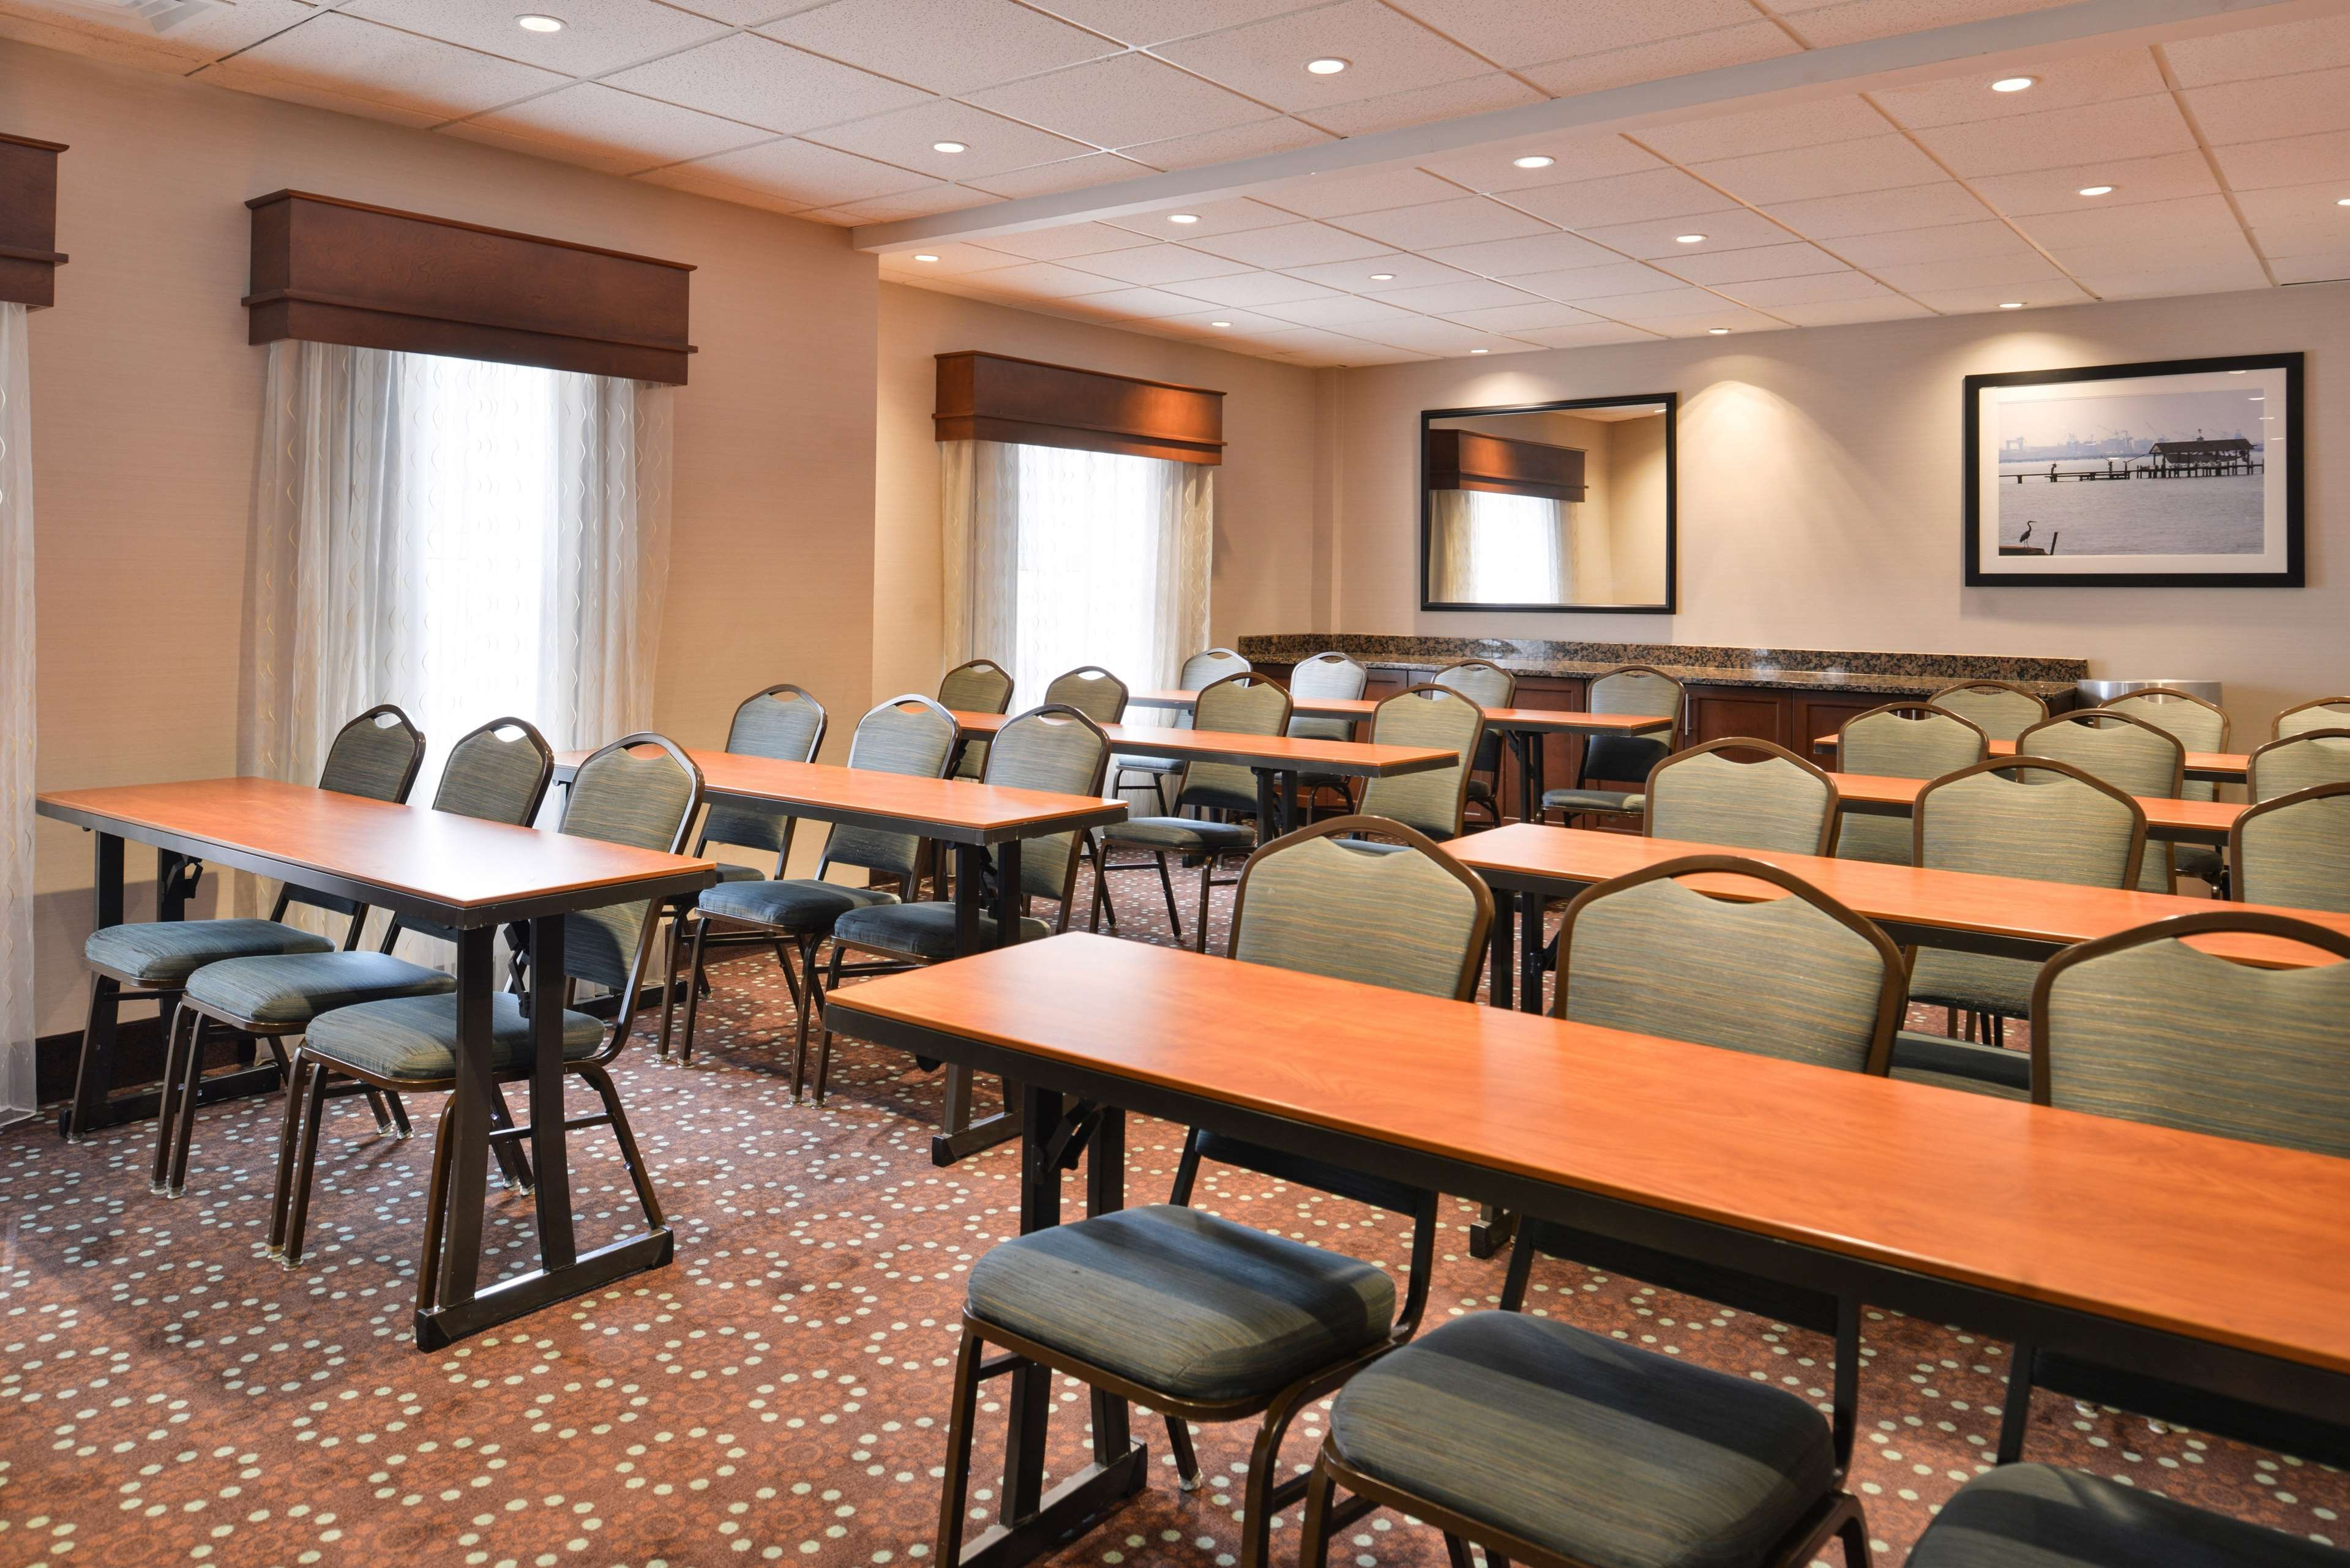 Hampton Inn & Suites Newport News (Oyster Point) image 47